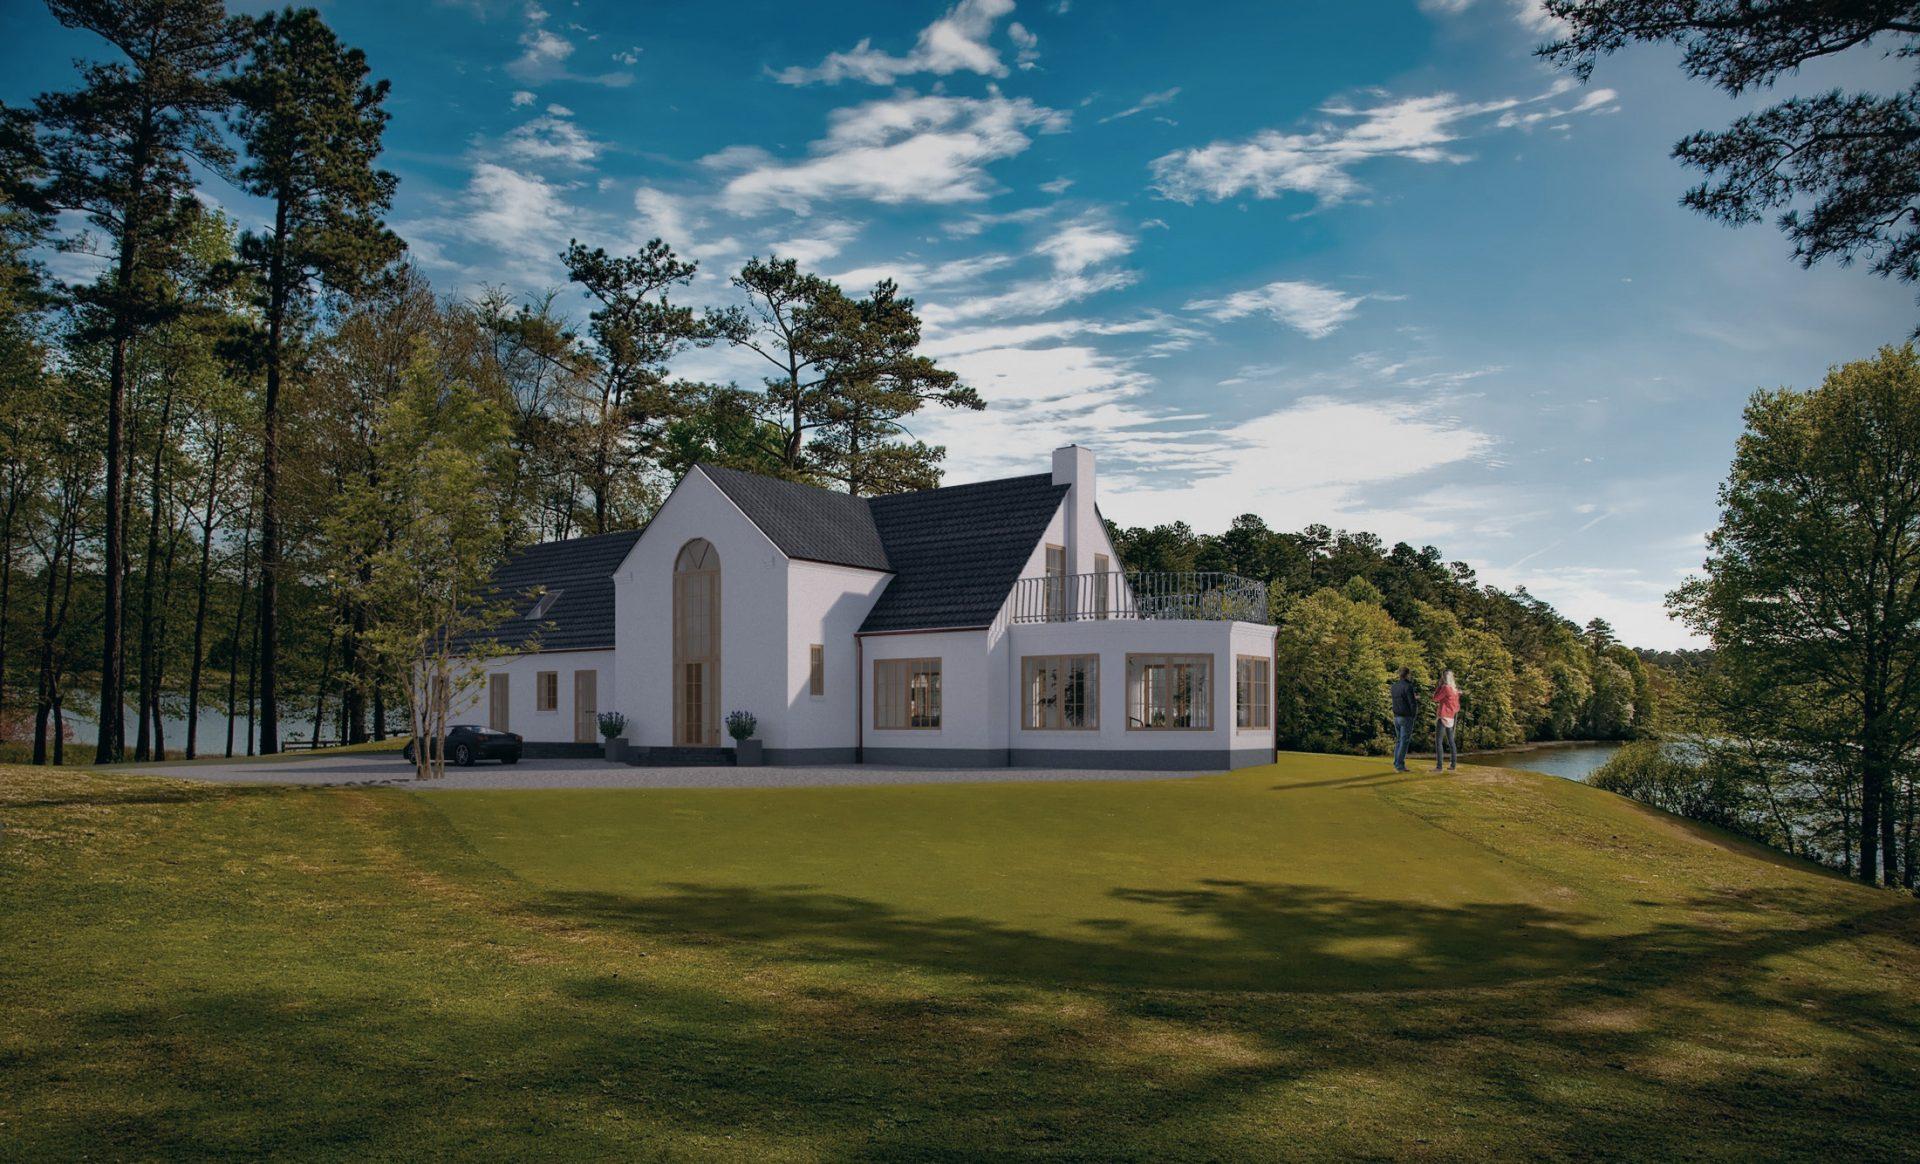 Nybyggeri Aalborg, Århus , Nordjylland, nyt hus i naturen